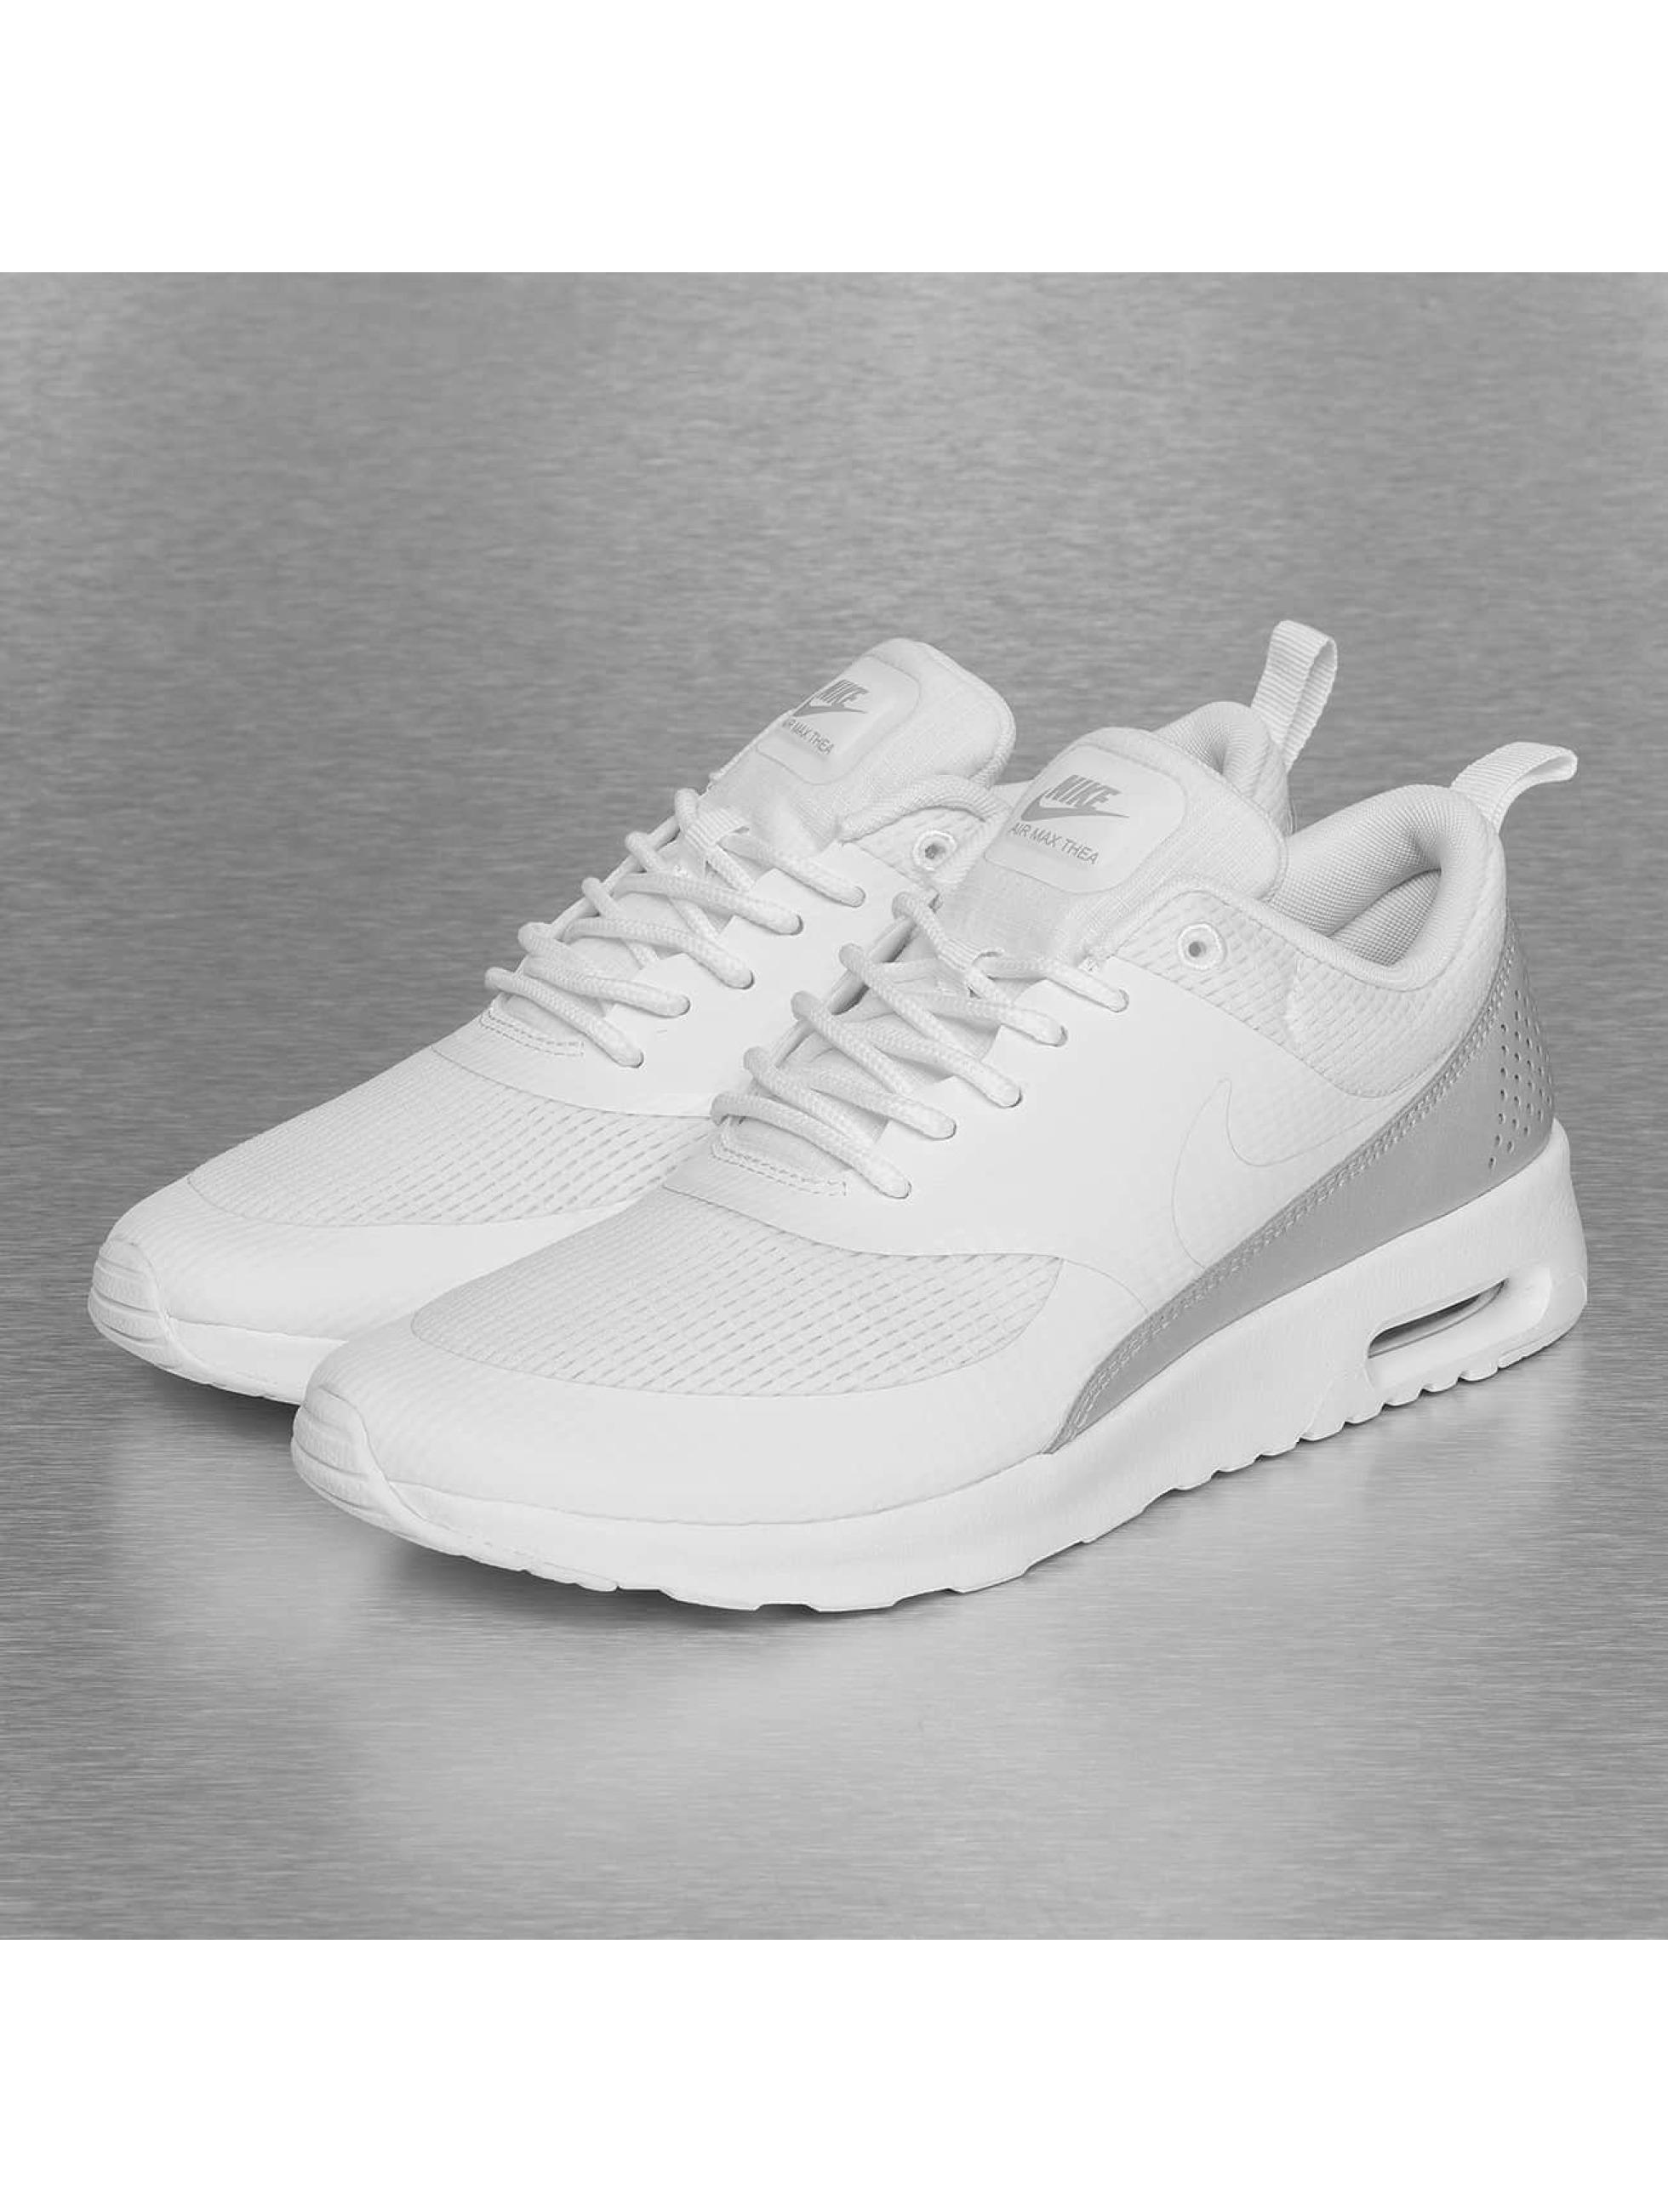 dames nike air max thea sneakers zwart/wit